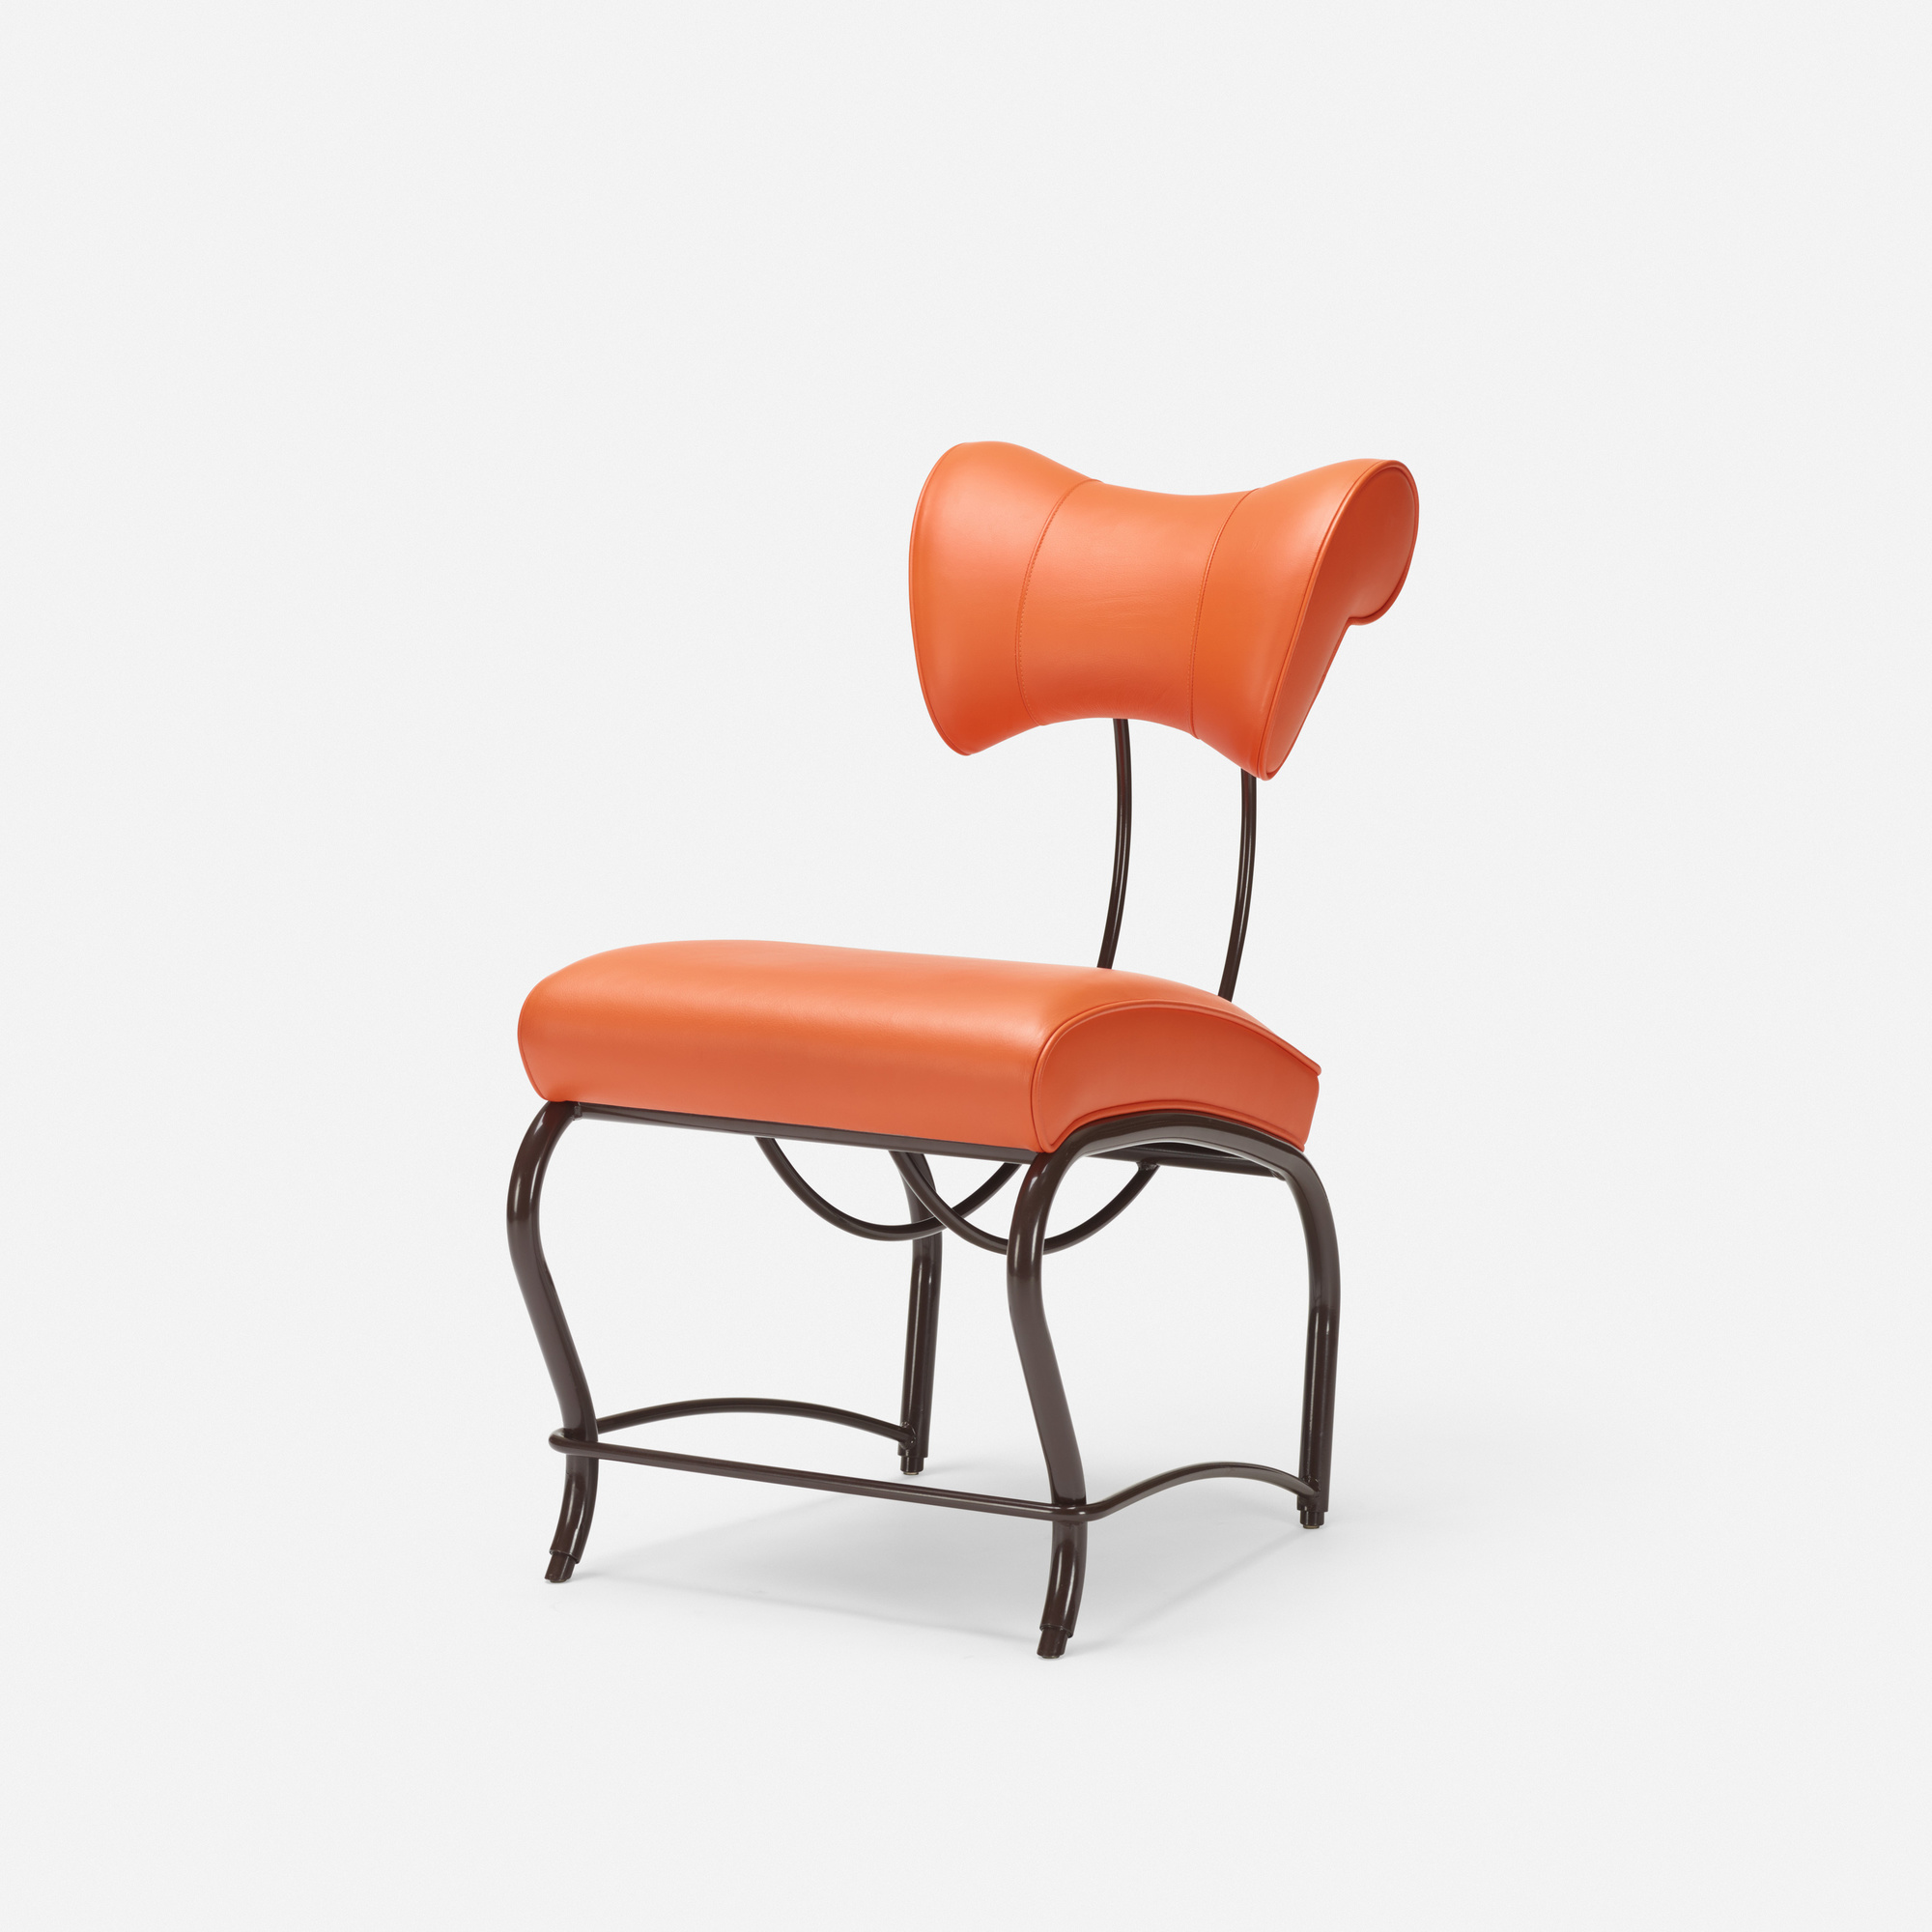 178: Jordan Mozer / Elbert Chair with Telescoping Toe (1 of 3)